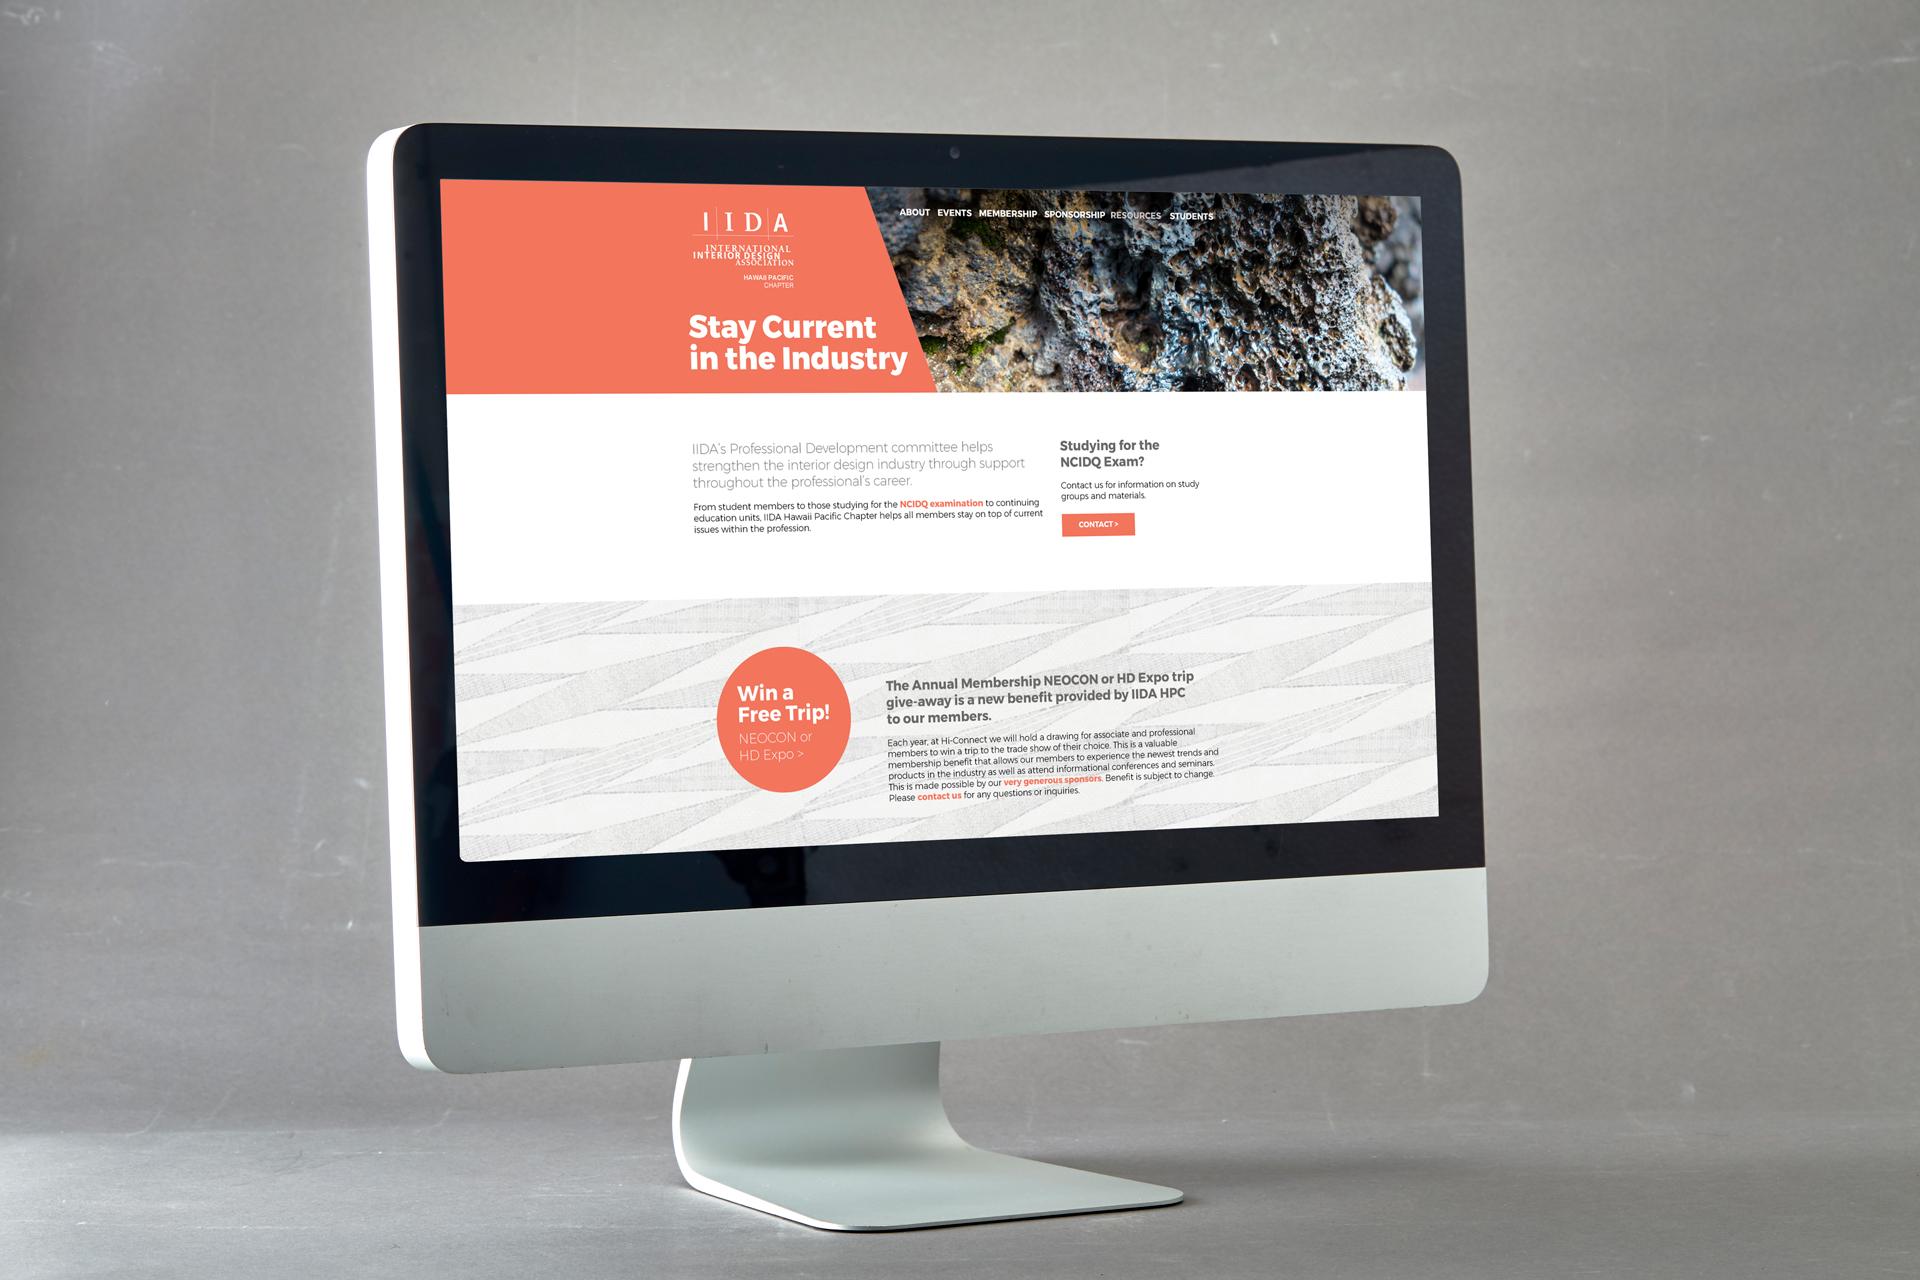 IIDAHPCwebsite7.jpg